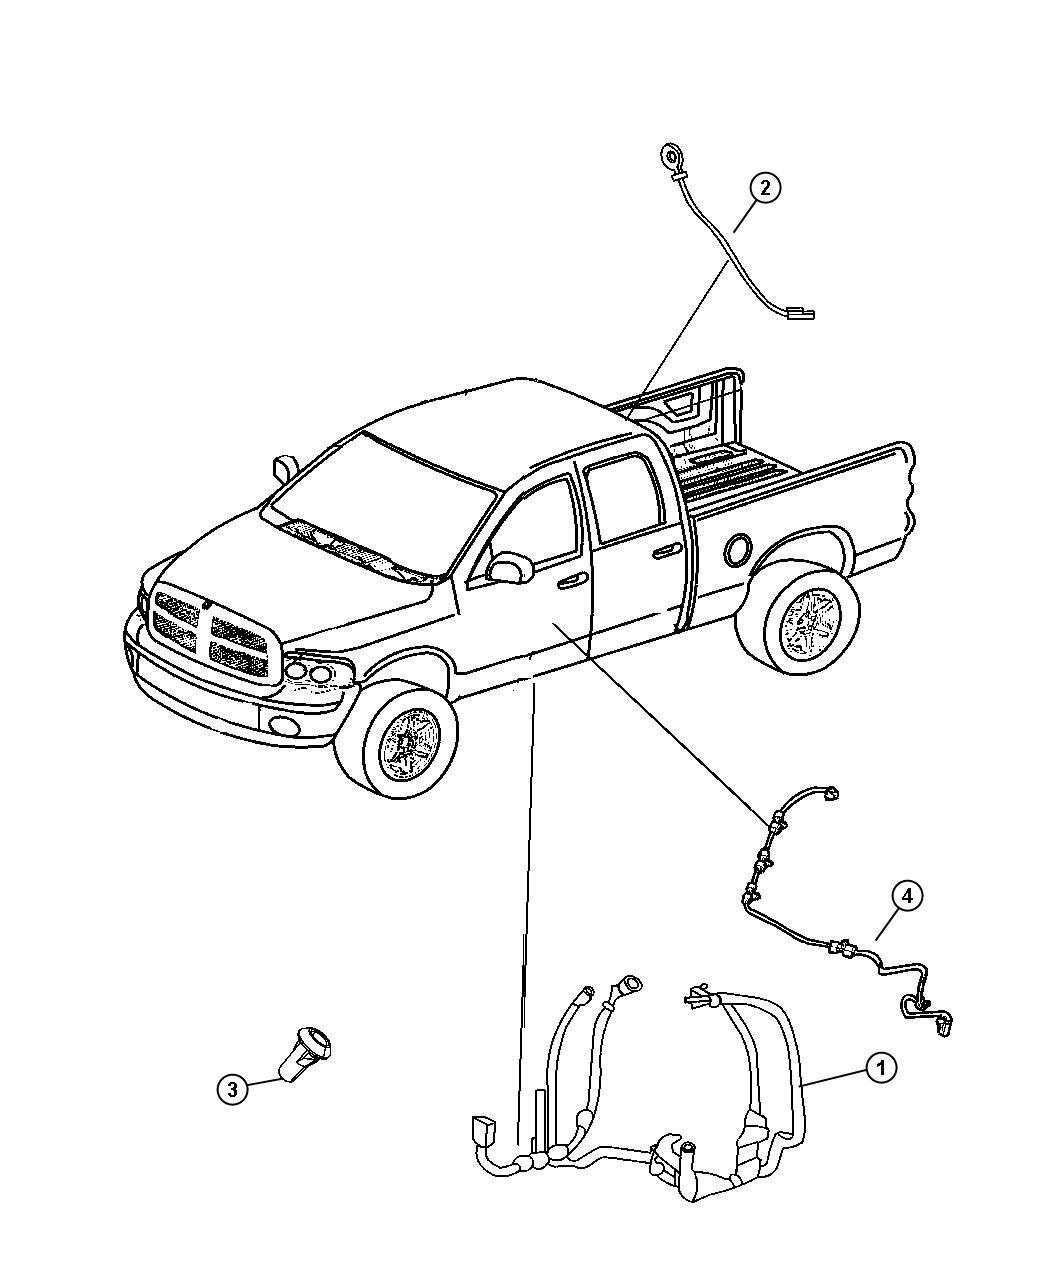 Dodge Ram Wiring Body Heated Second Row Seats